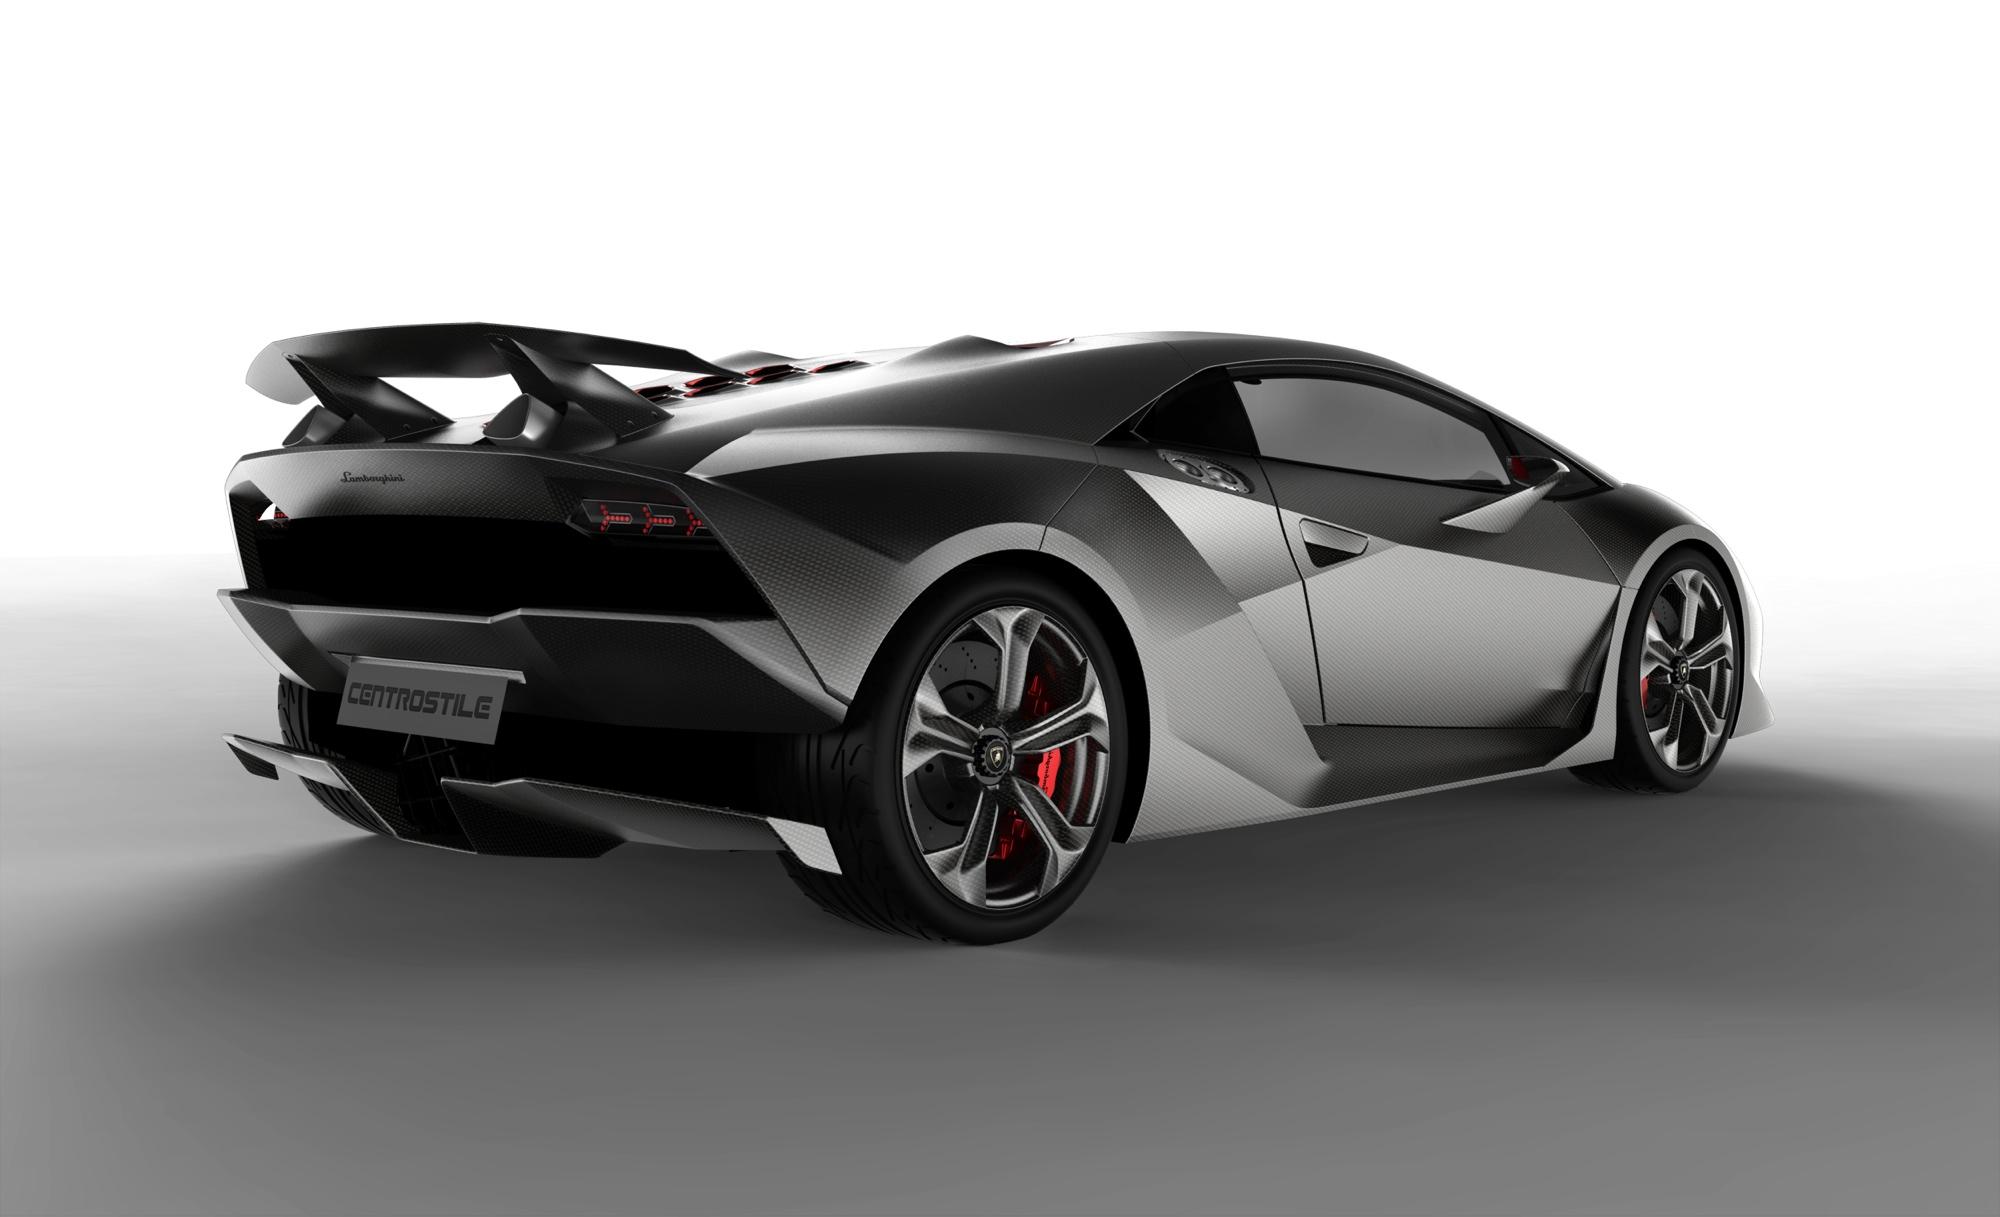 Gentil Lamborghini Sesto Elemento